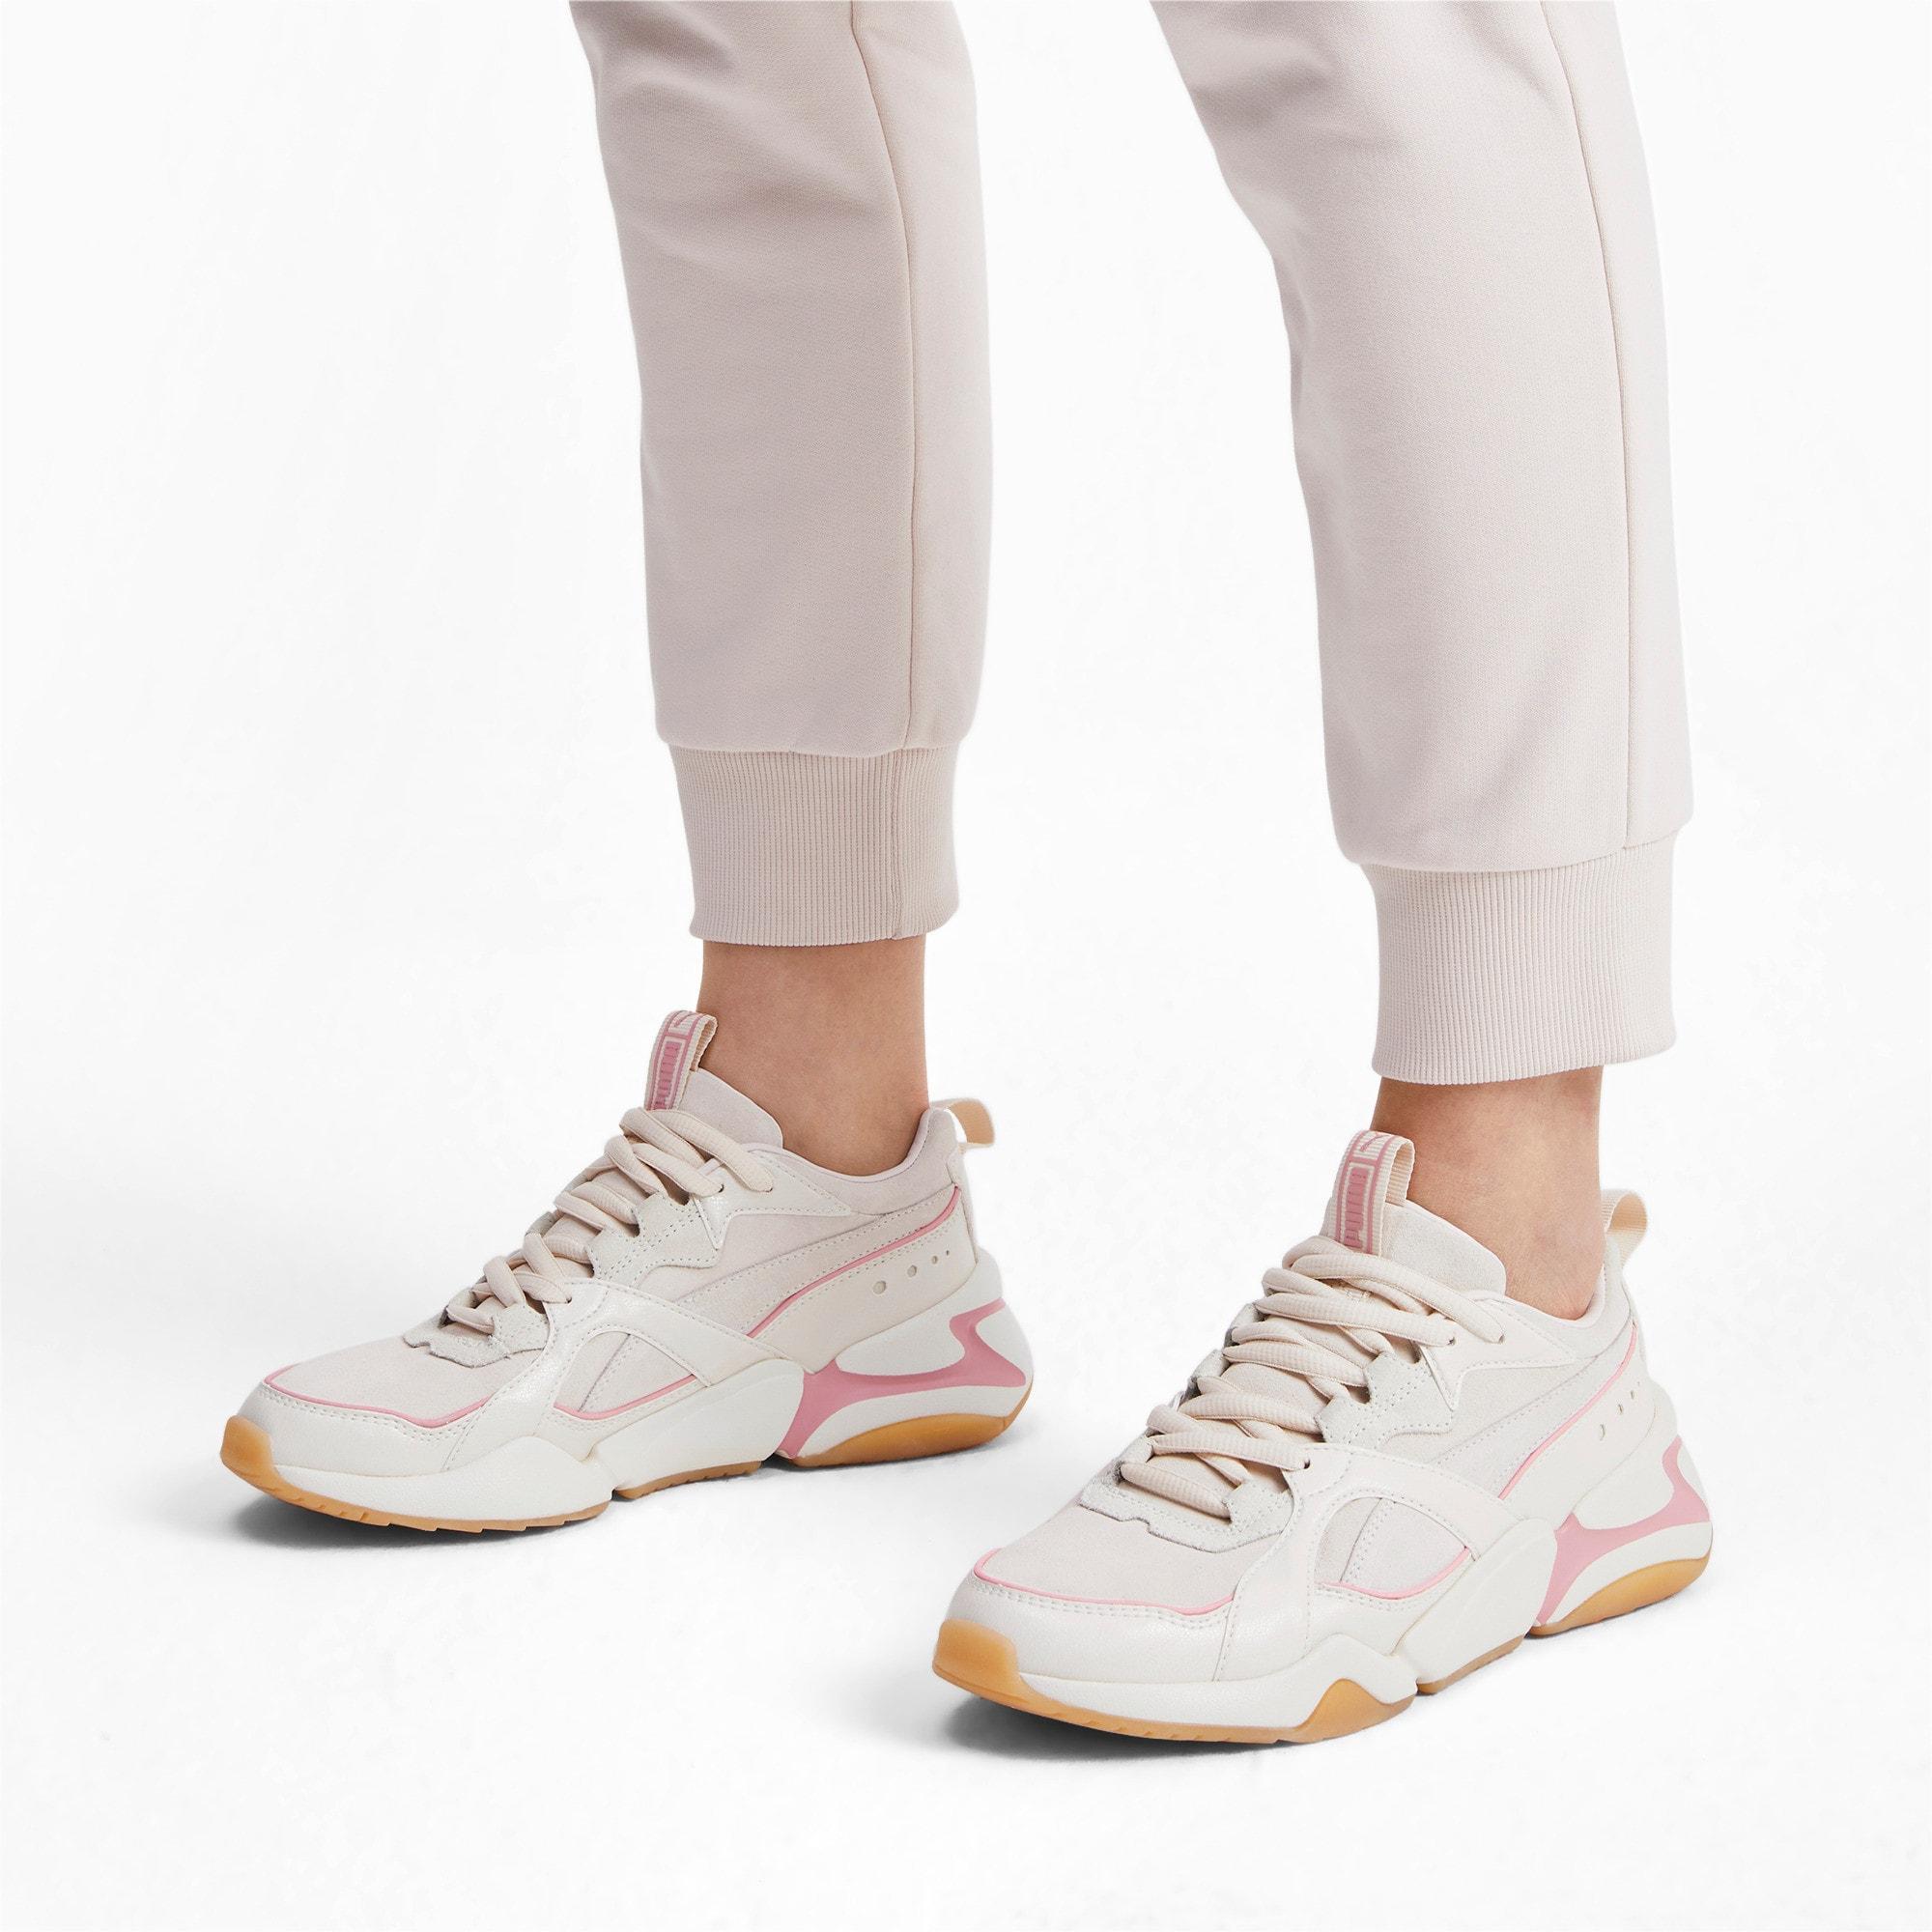 Thumbnail 2 of Nova 2 Suede Women's Sneakers, Pastel Parchment-Whisp White, medium